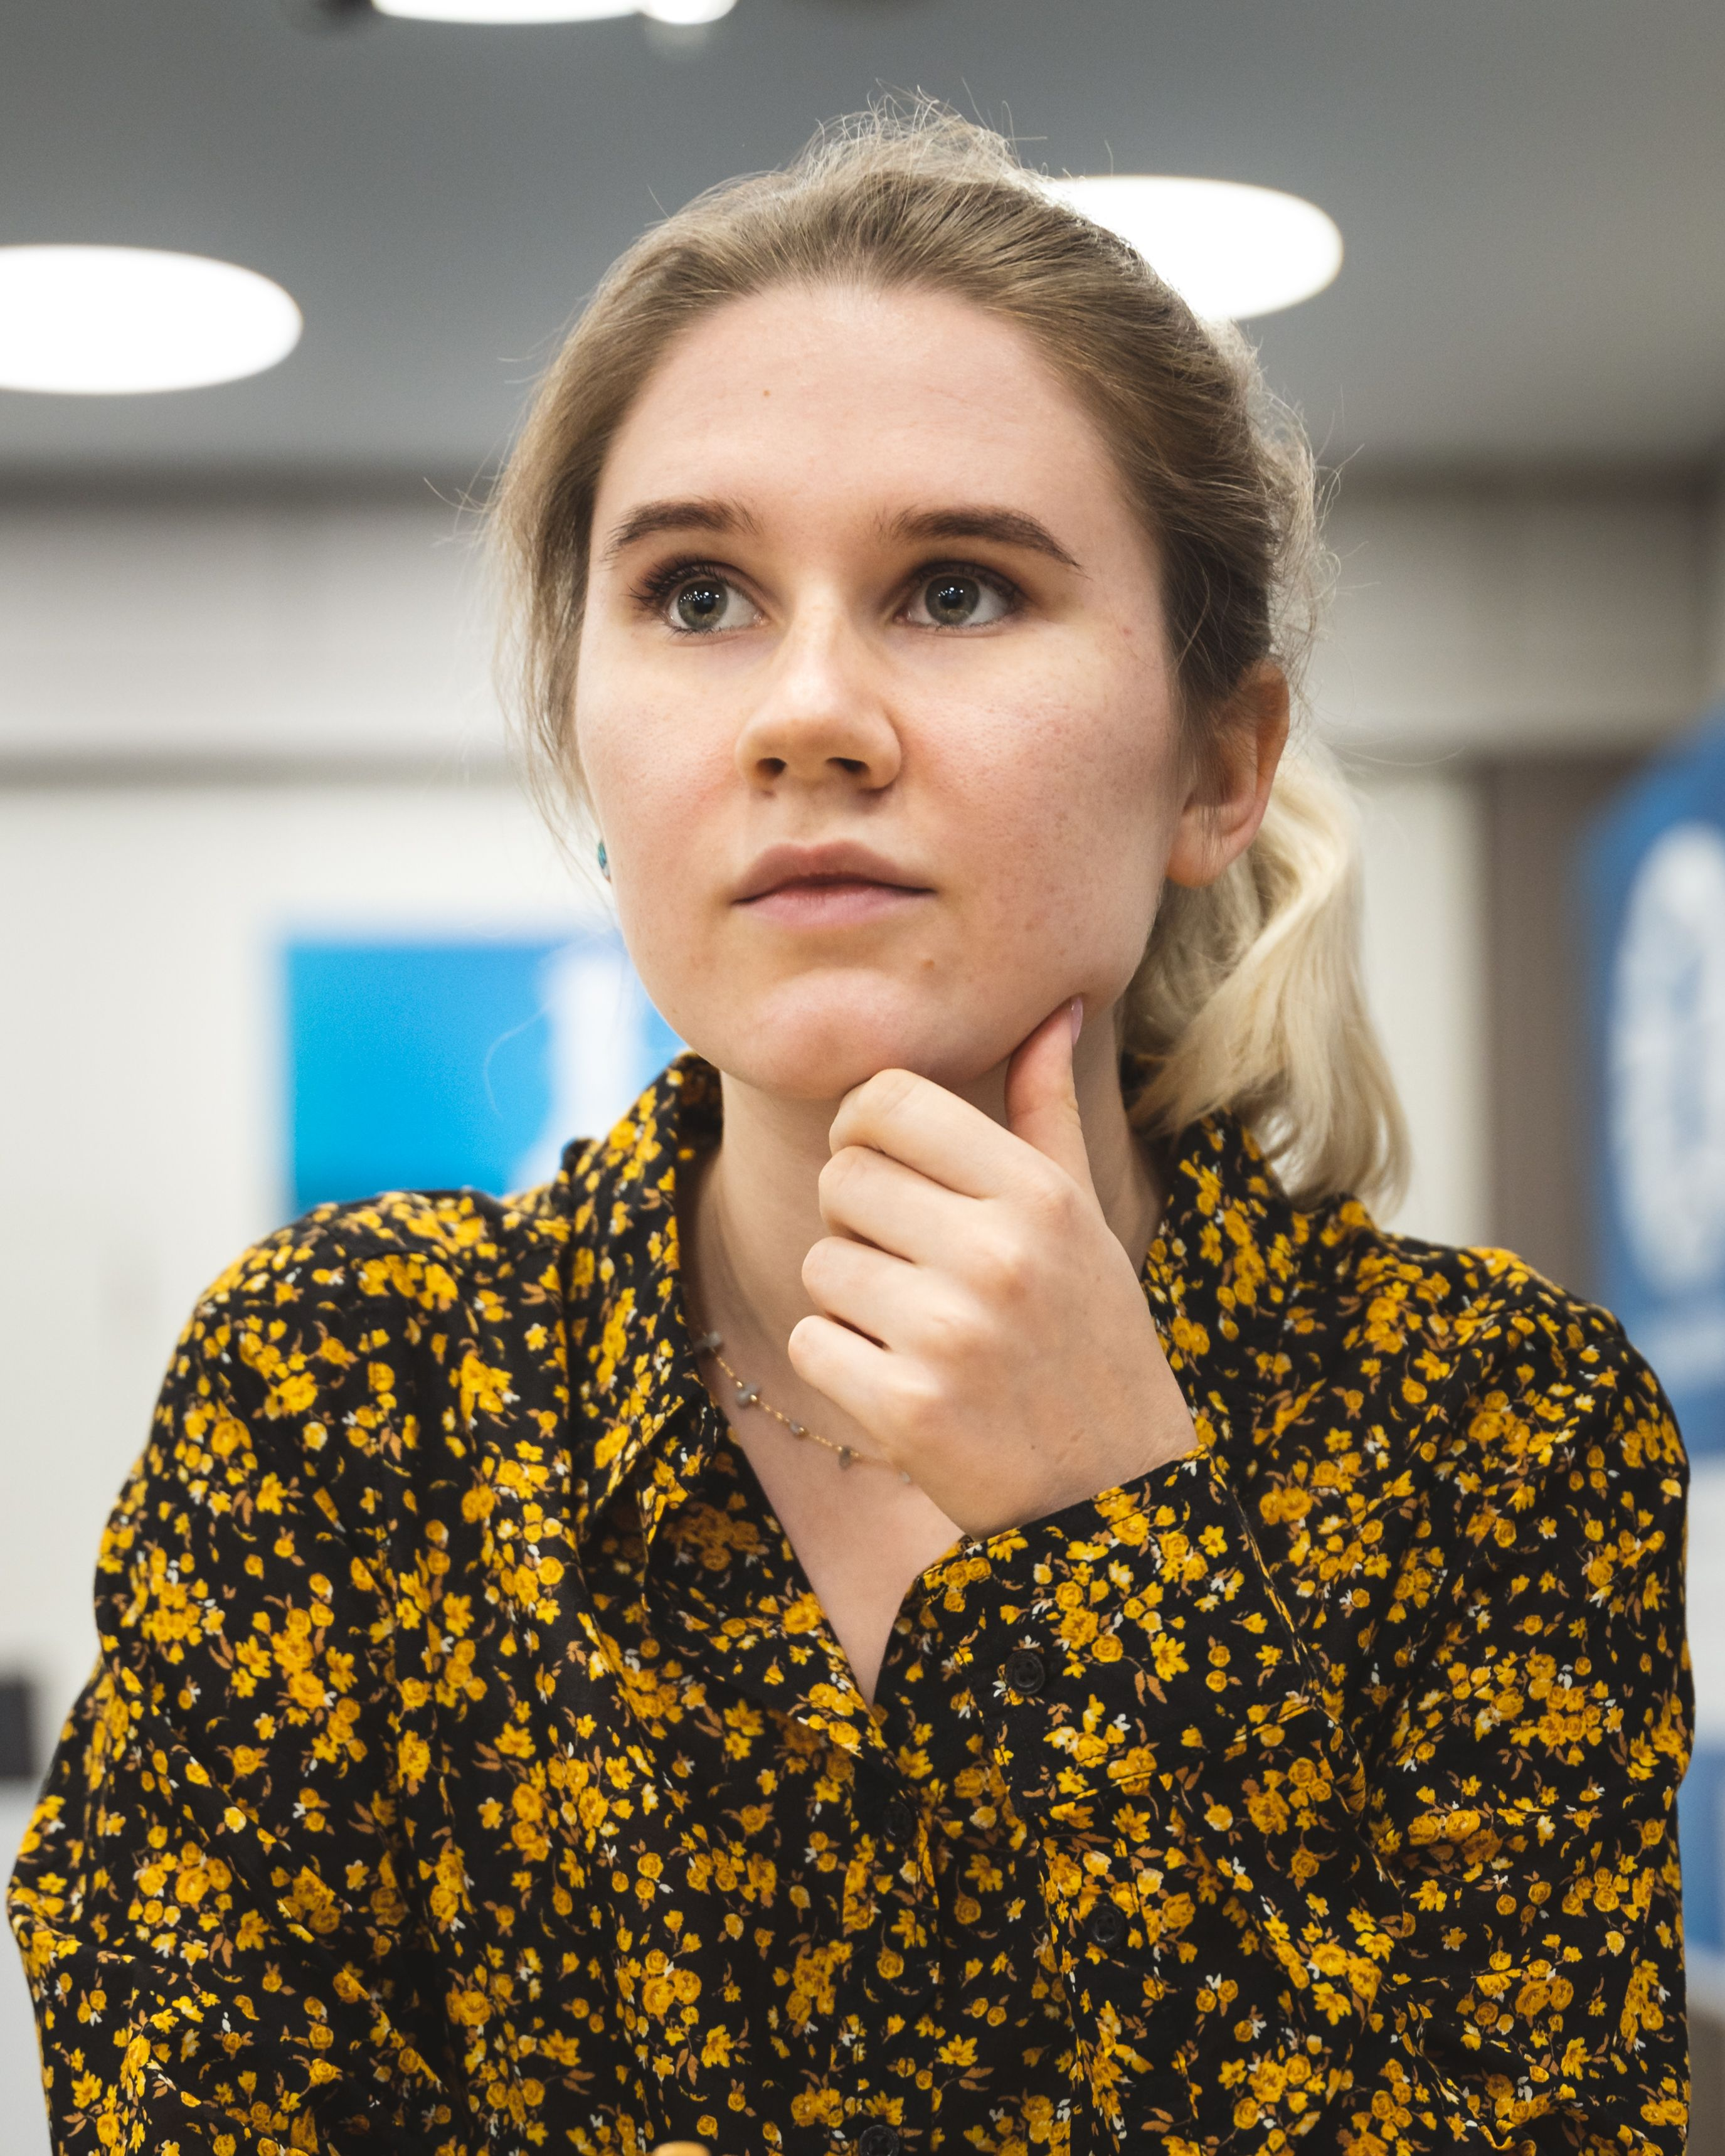 Russian IM Polina Shuvalova at the Women's World Team Championship